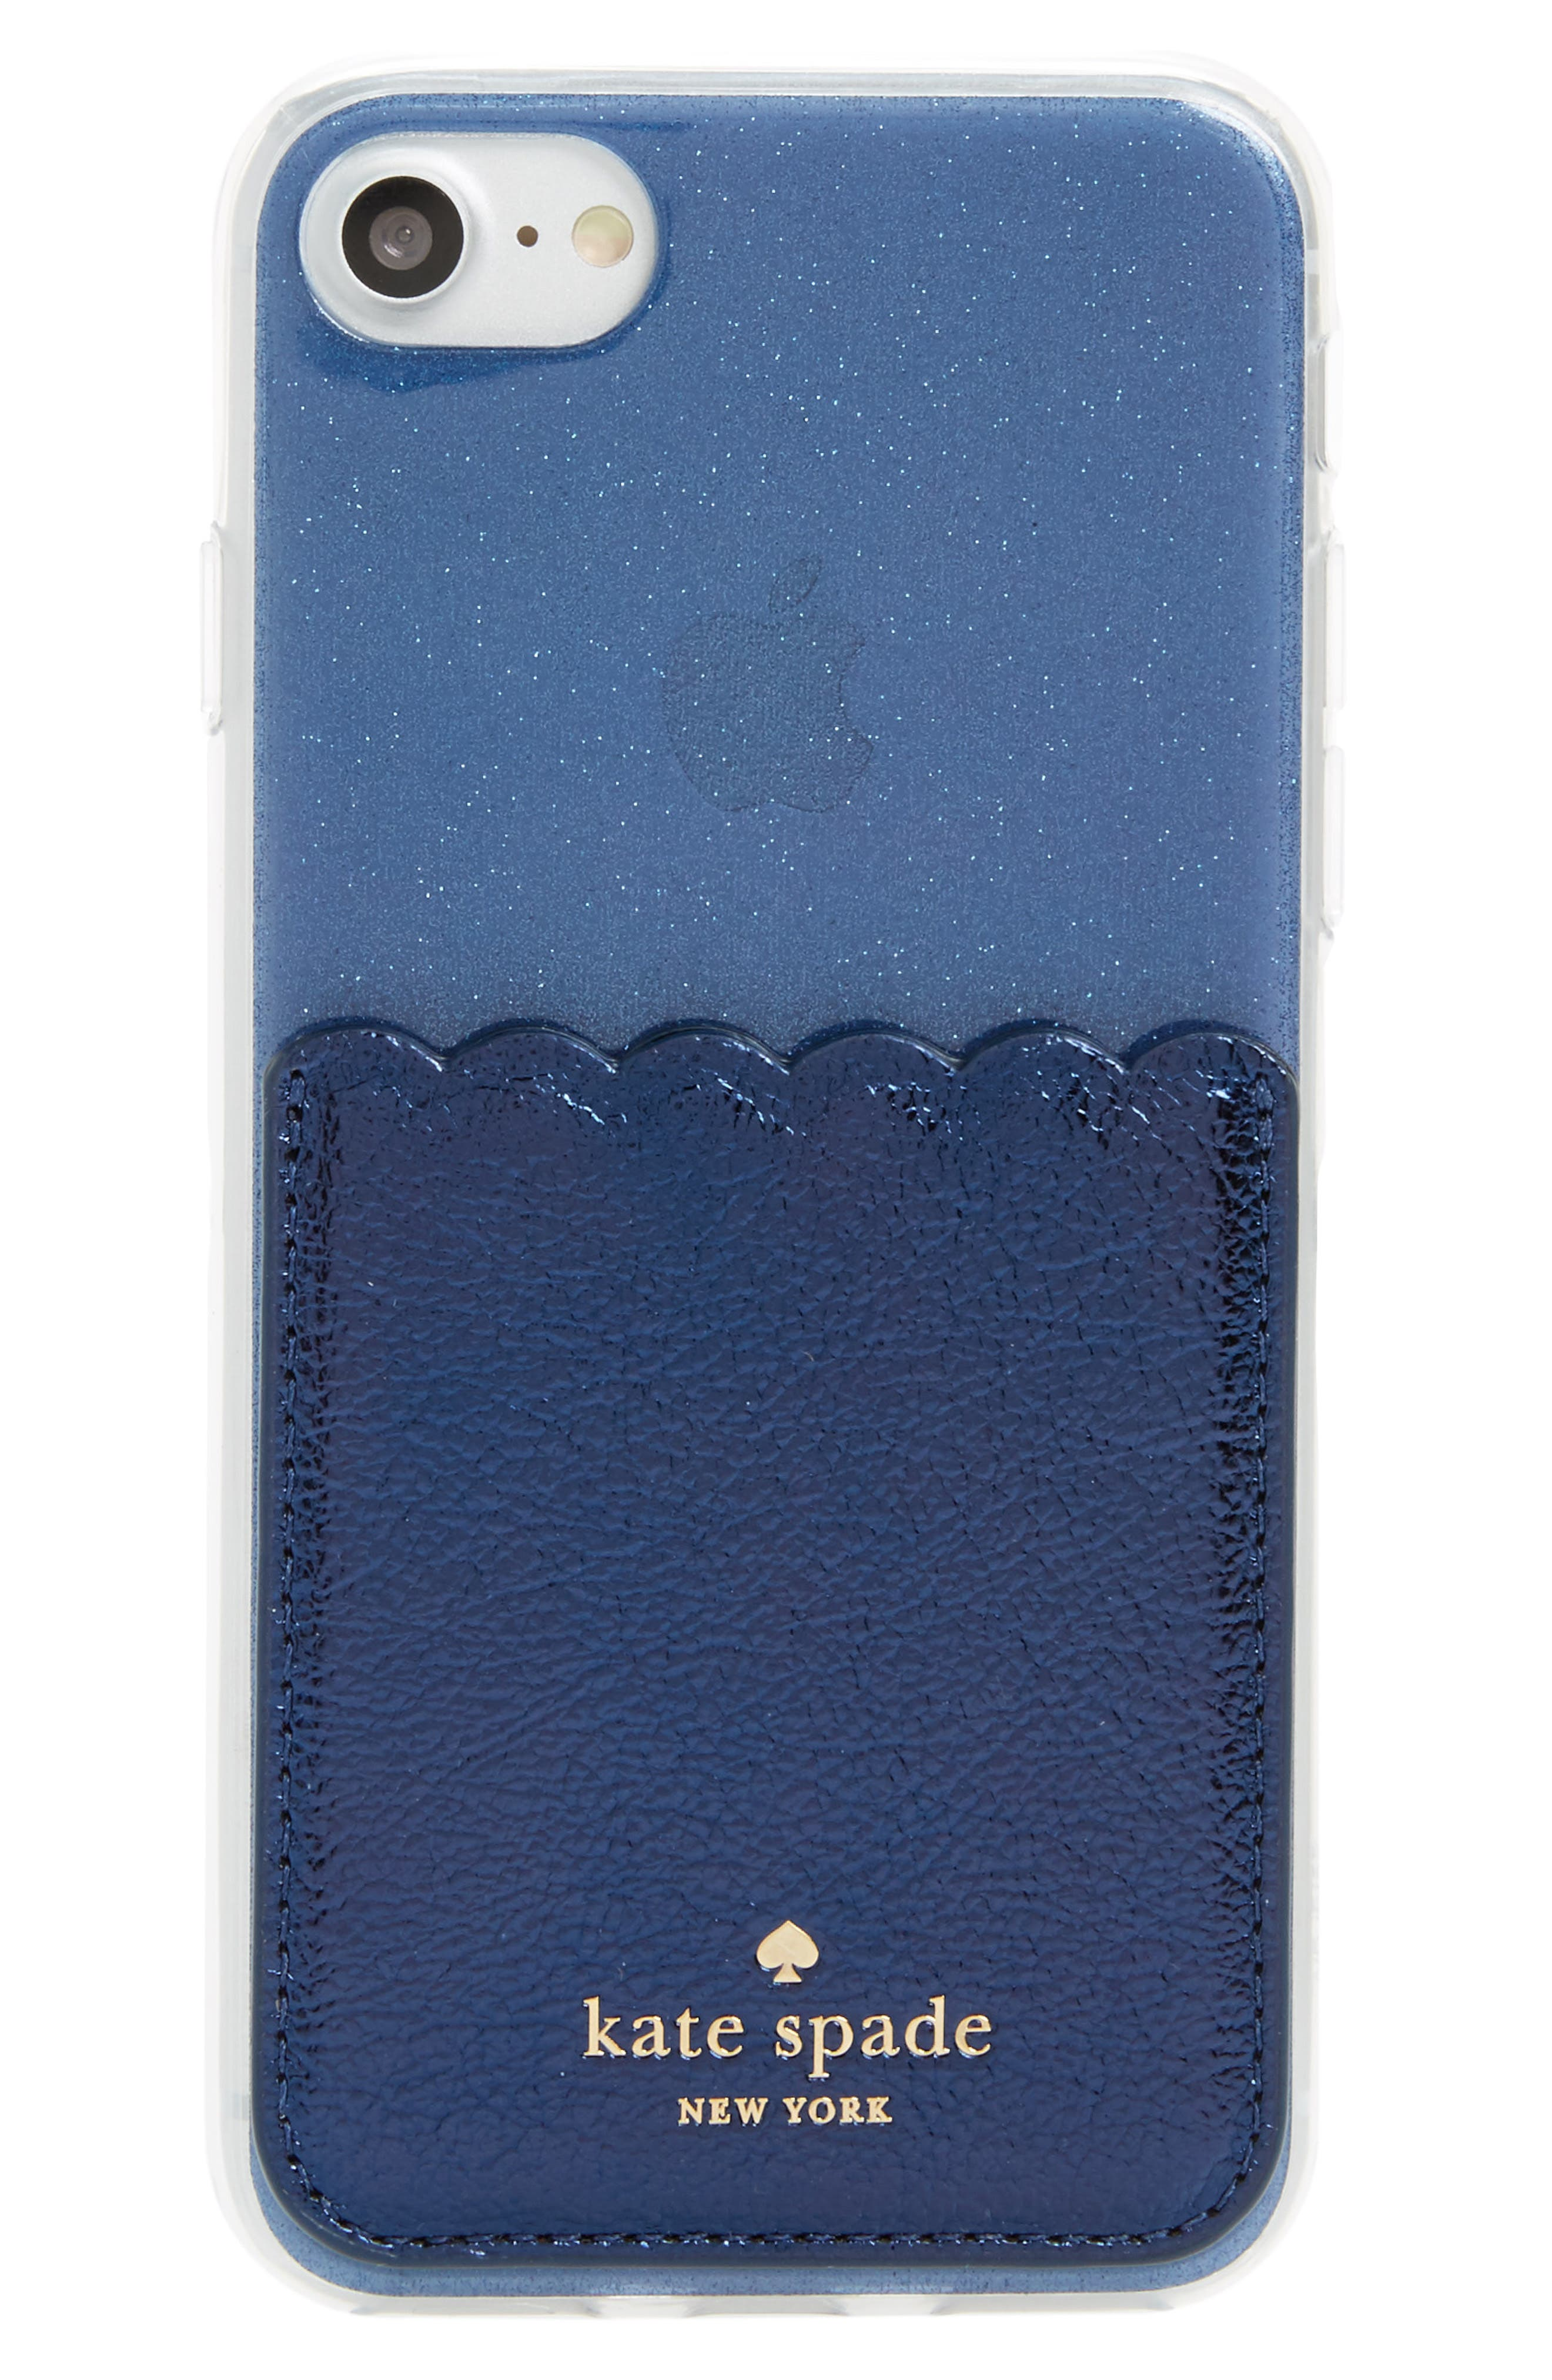 kate spade new york stick to it iPhone 7/8 case & sticker pocket